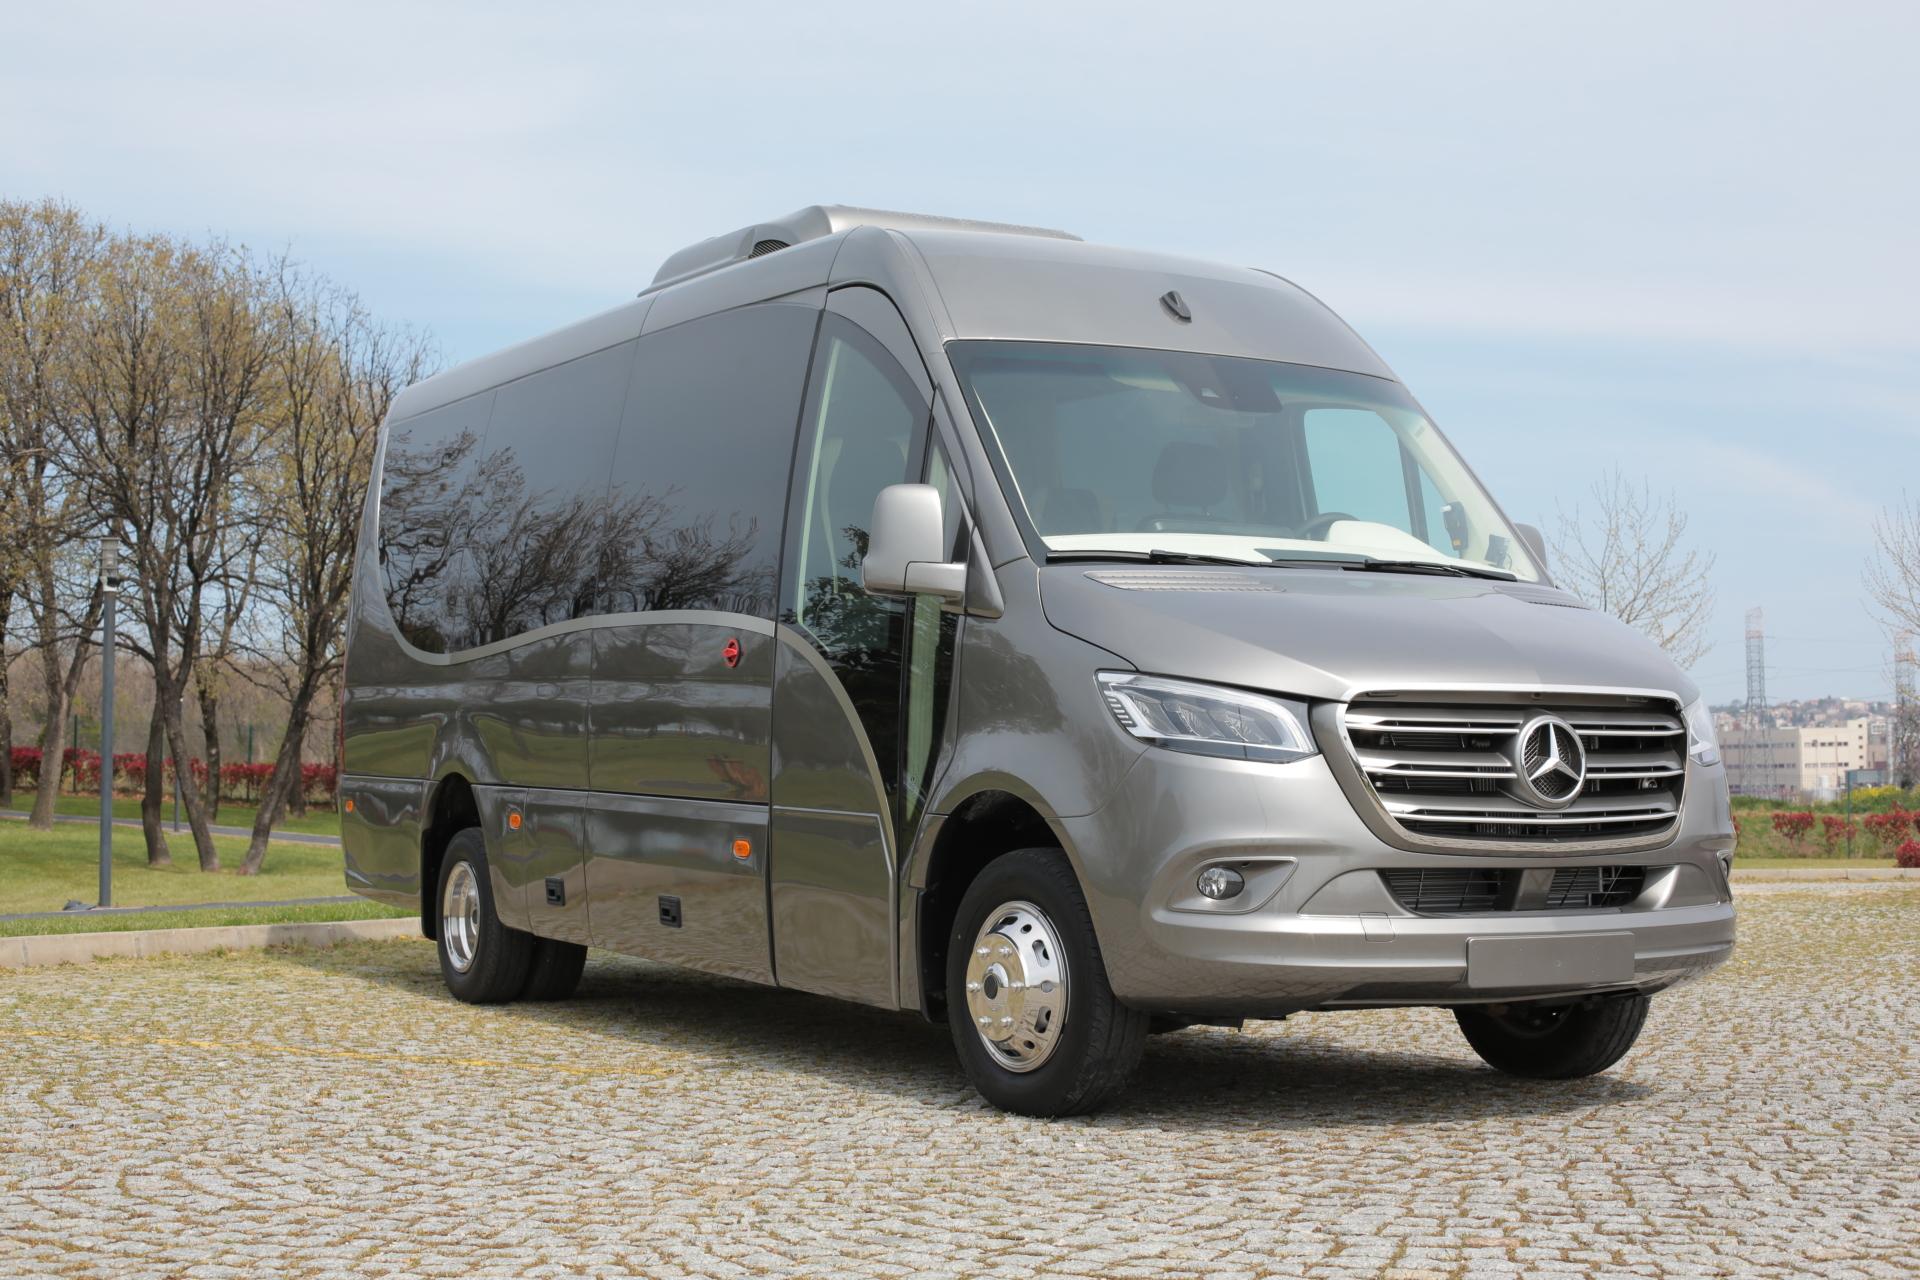 Mercedes Sprinter turistbuss